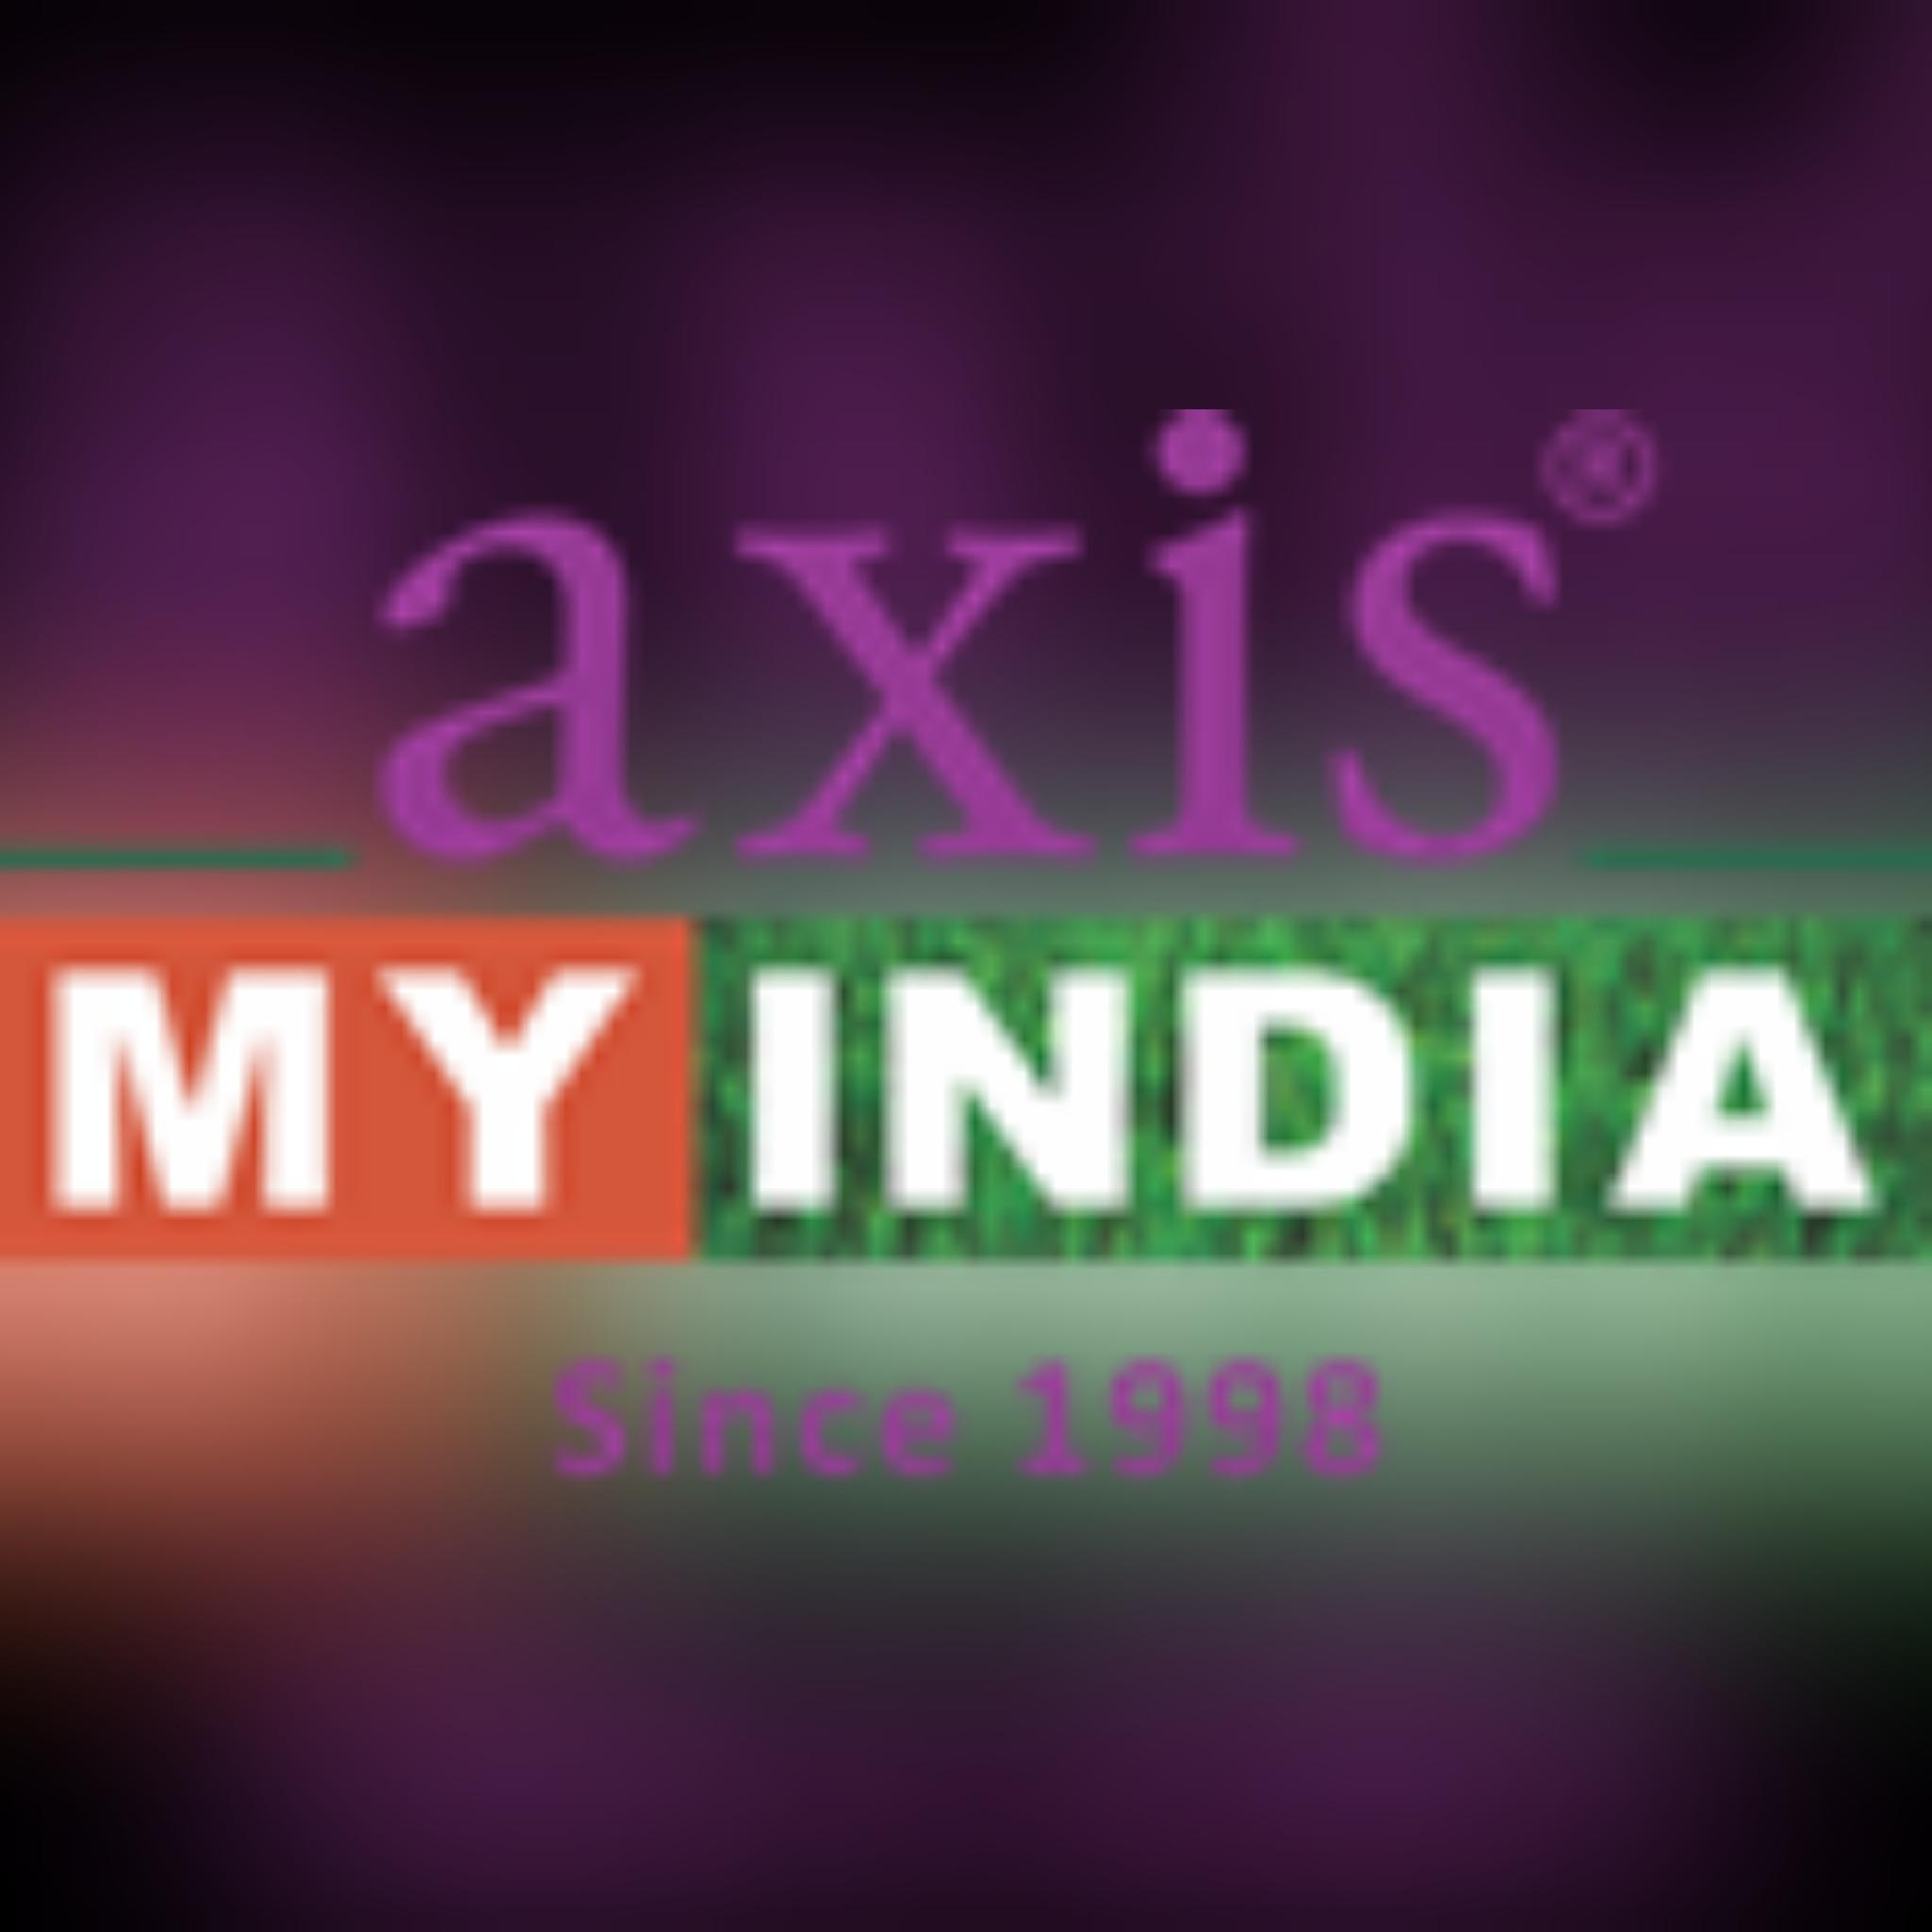 https://www.indiantelevision.com/sites/default/files/styles/smartcrop_800x800/public/images/tv-images/2021/10/05/photogrid_plus_1633437676539.jpg?itok=OQk2wdn3